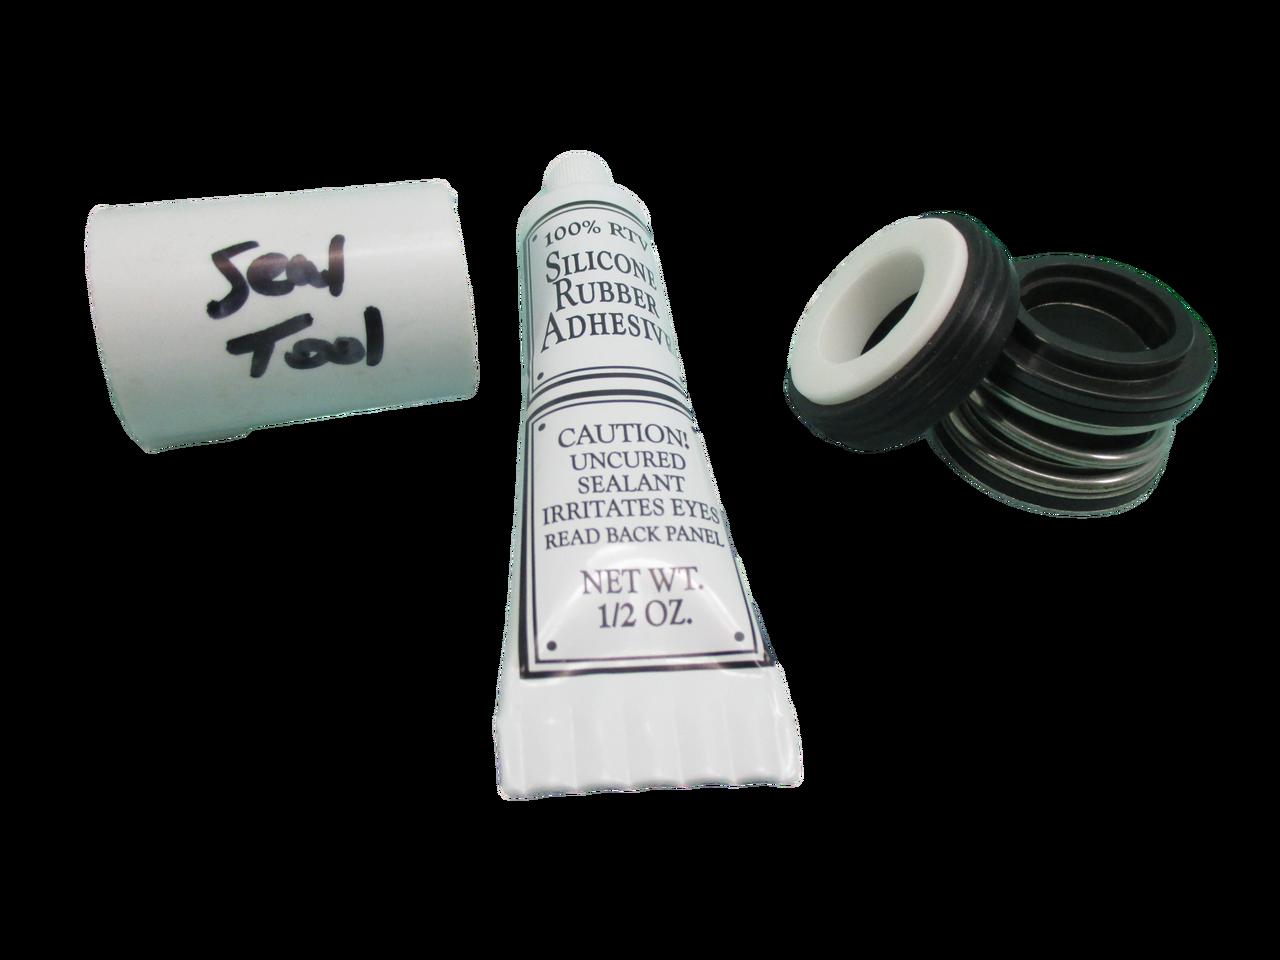 Kit Jacuzzi.Jacuzzi 4 Mount Piranha Thera Max Thera Flo Pump Seal Parts Kit With Silicon